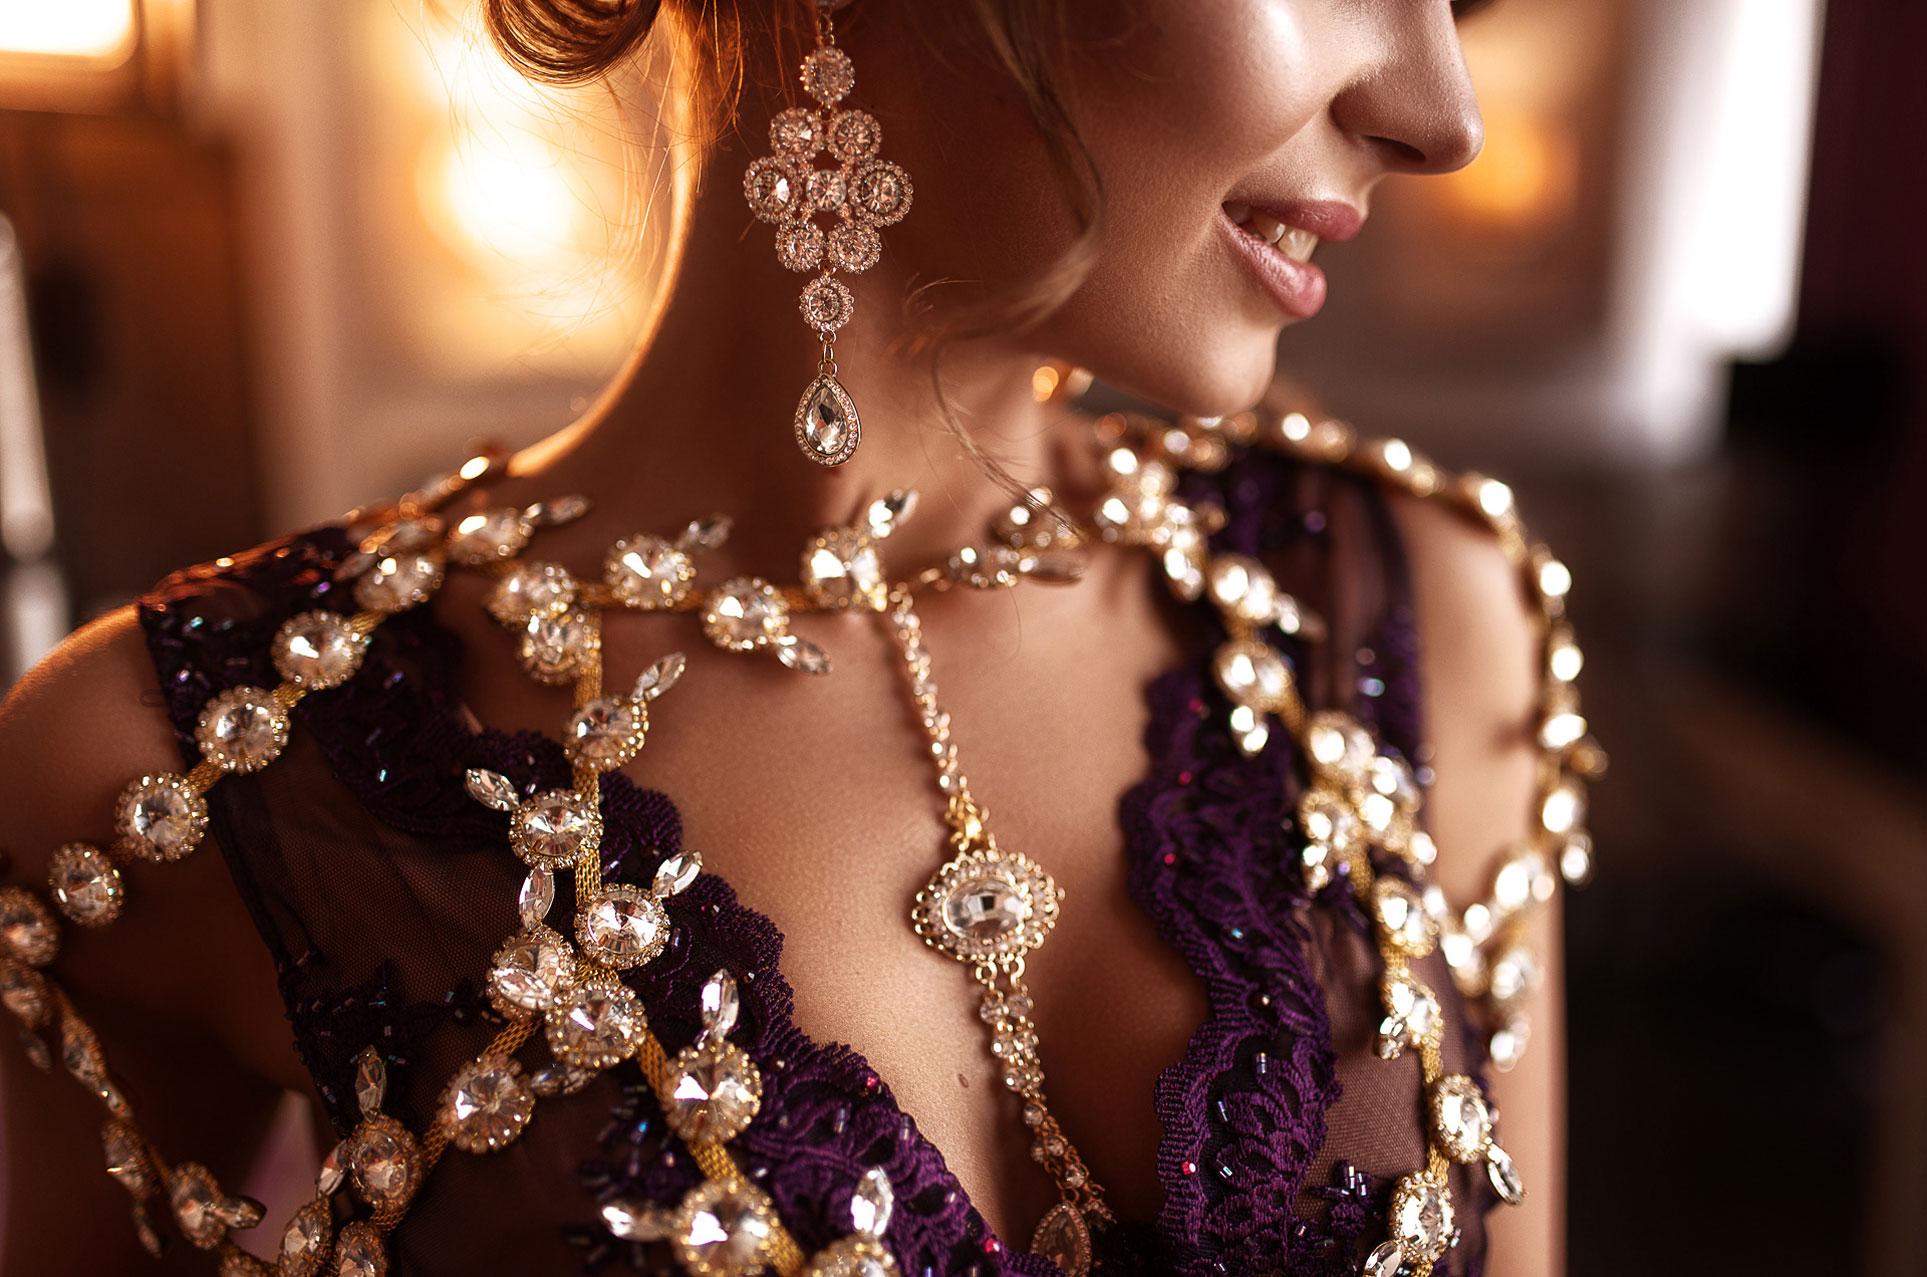 Luxury / Kris Zolotaryova by Maks Kuzin